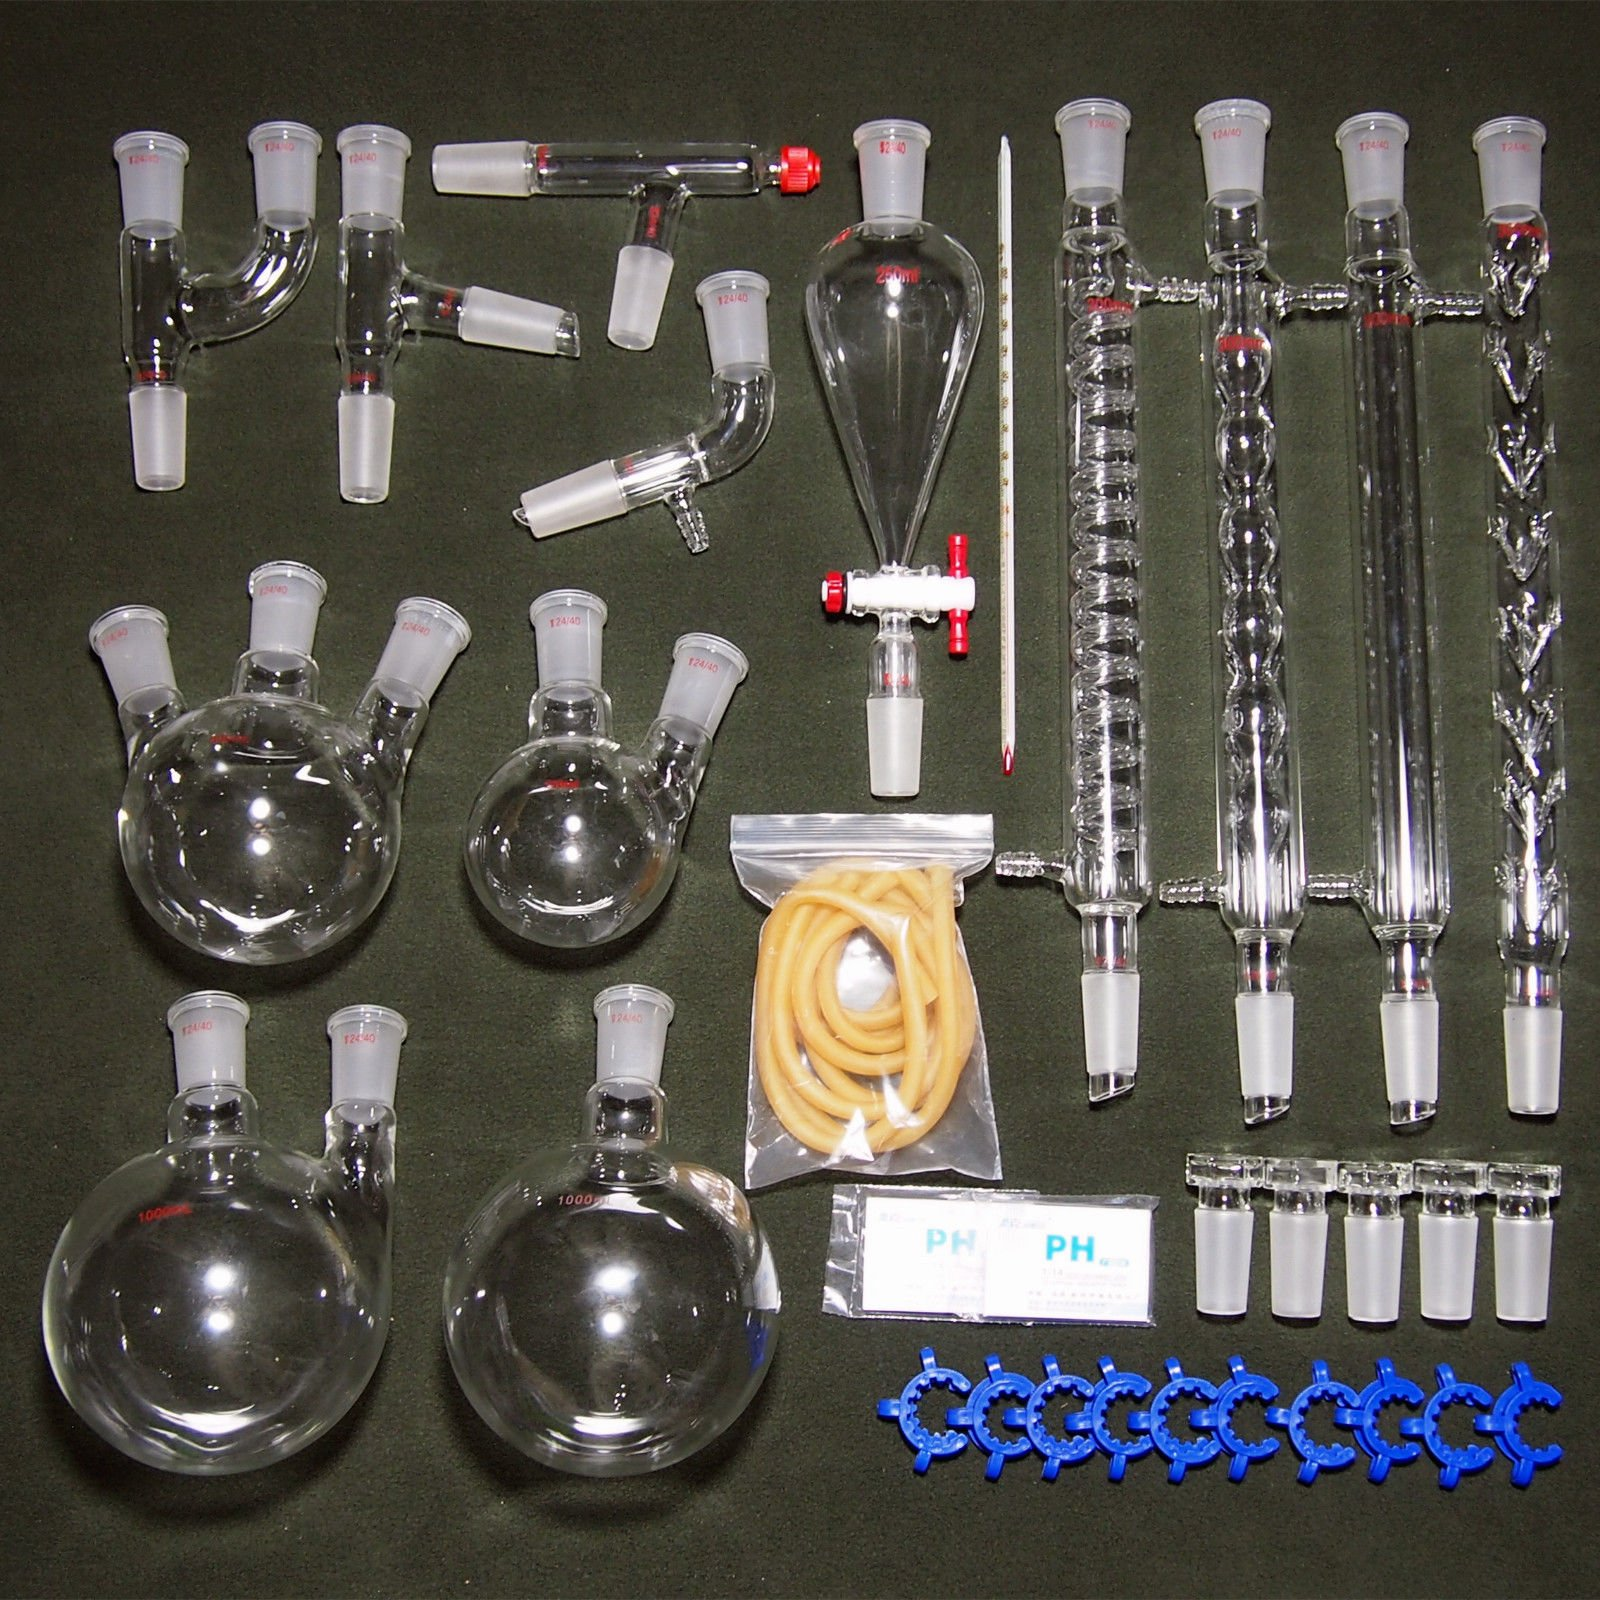 24/40,New Organic Laboratory Glassware Kit,32 PCS,Lab Unit by Deschem